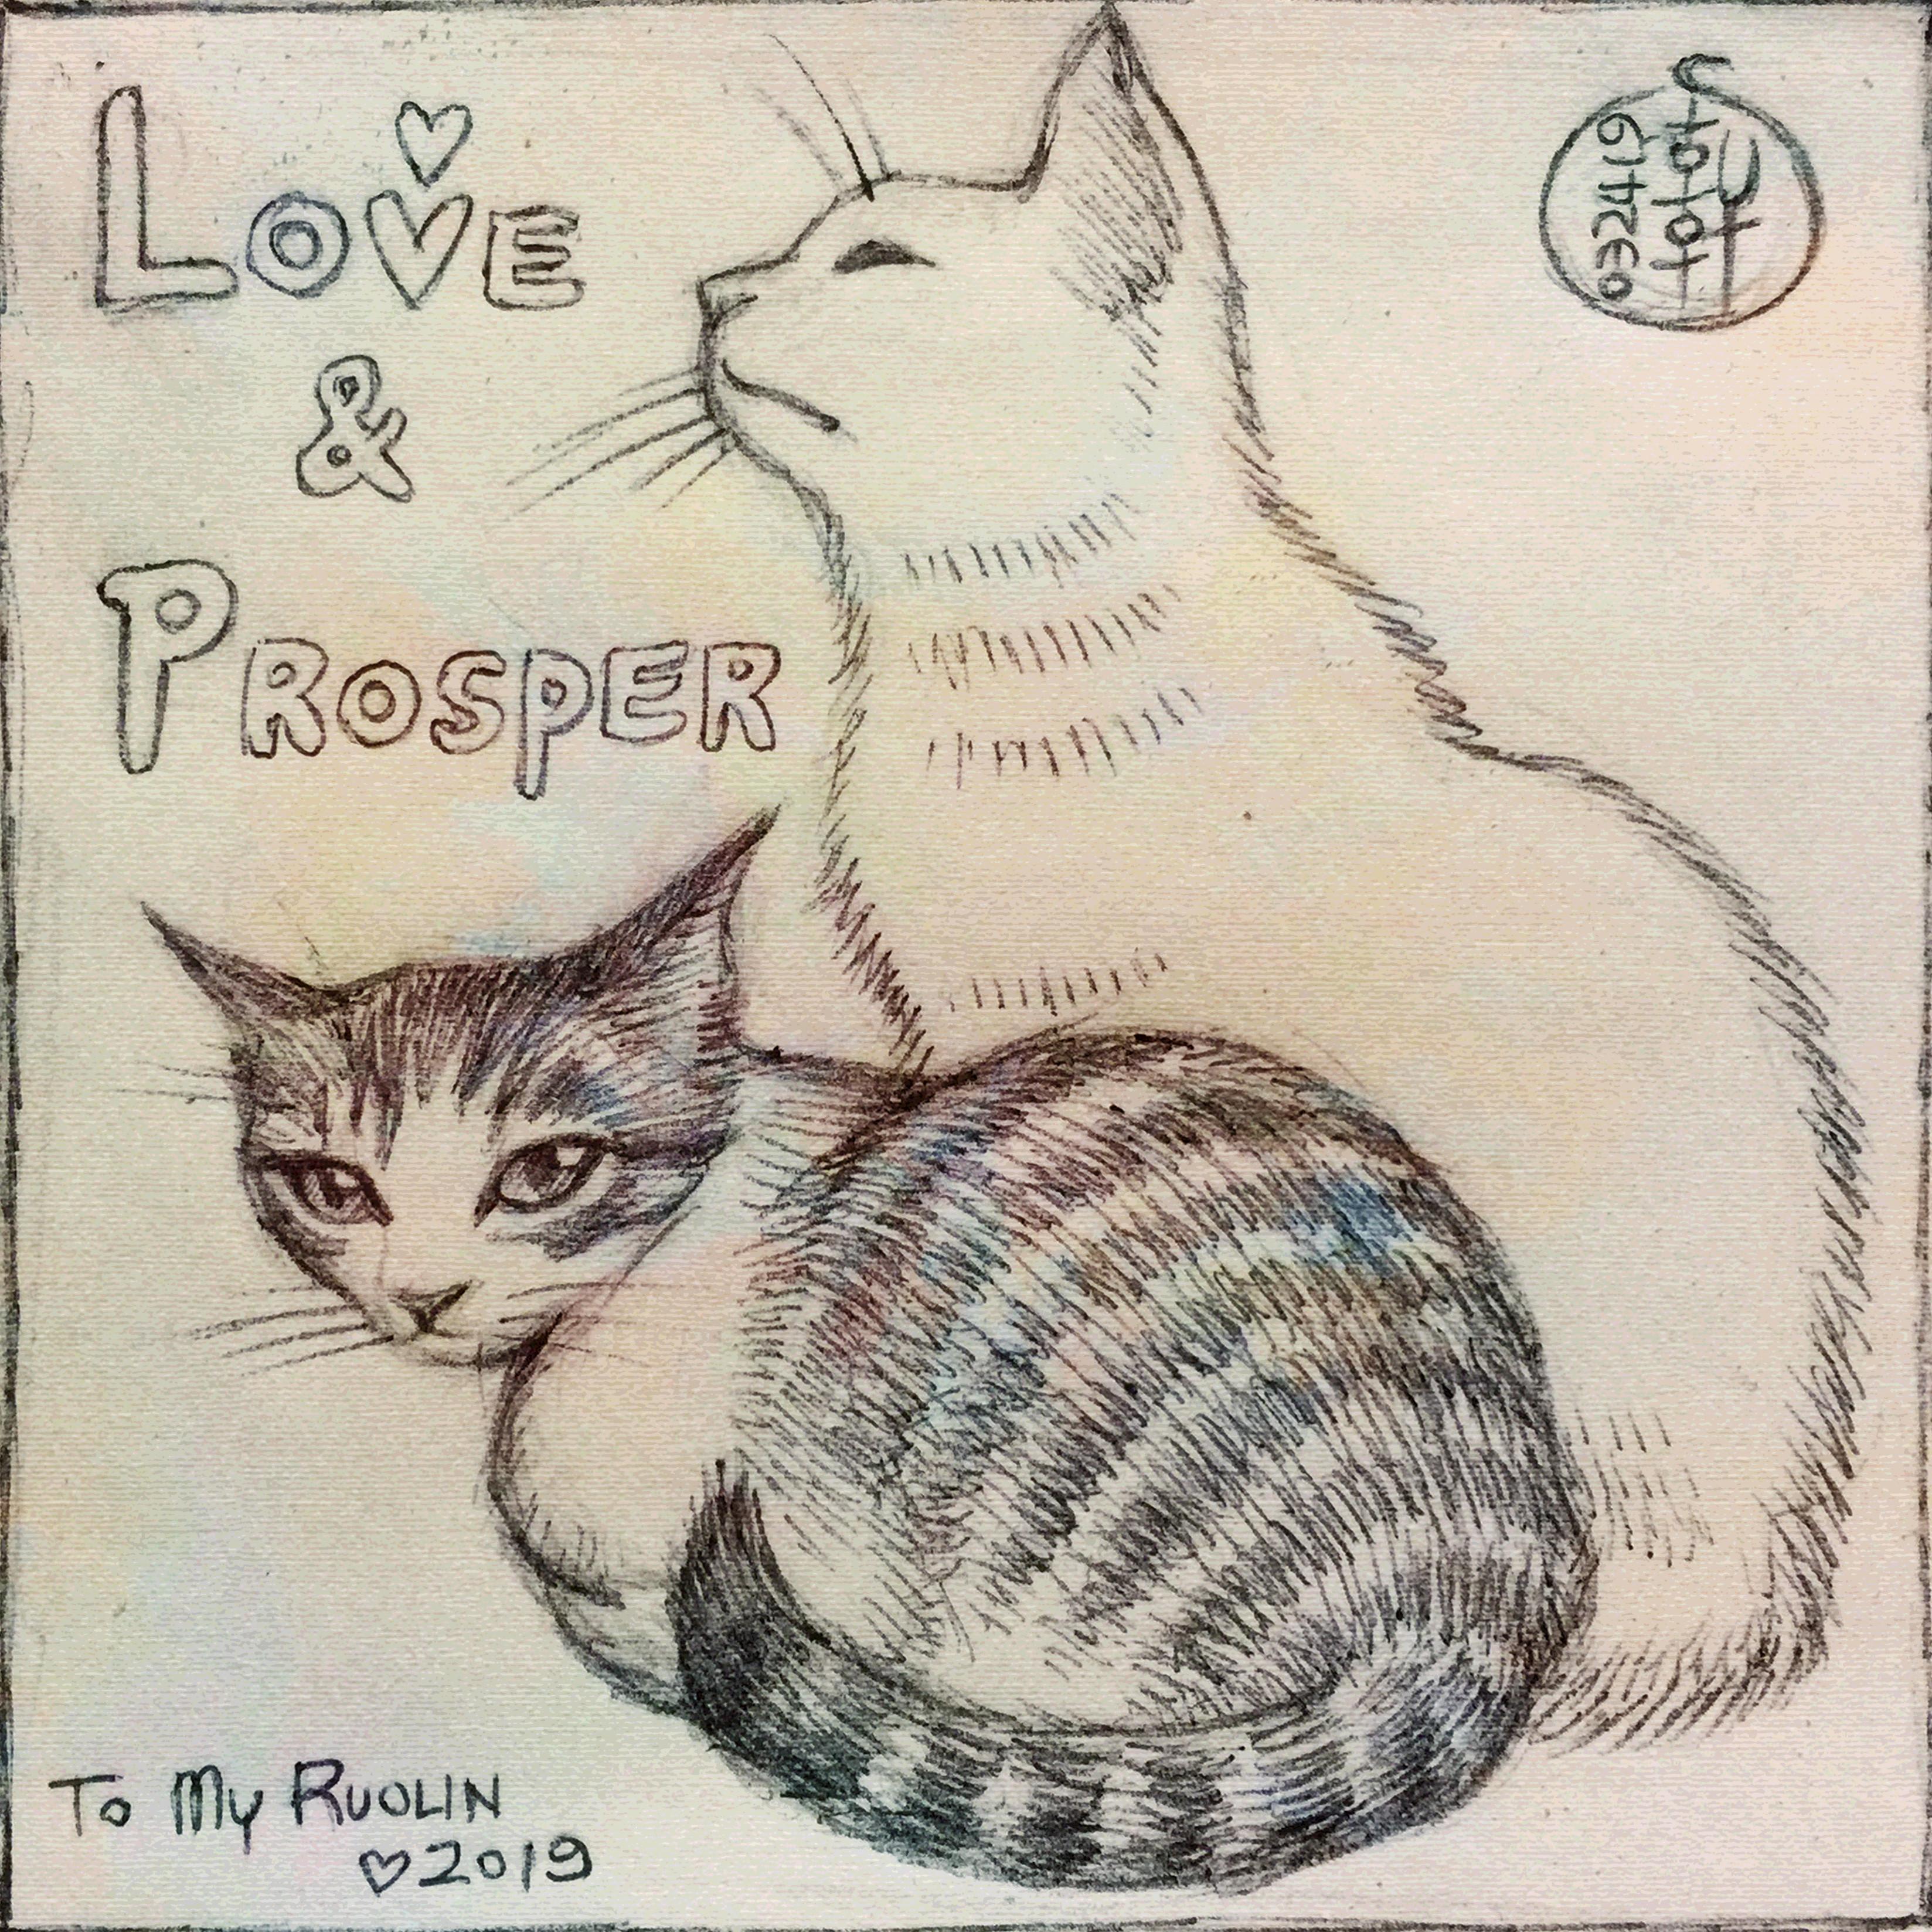 Love and Prosper - Sketch